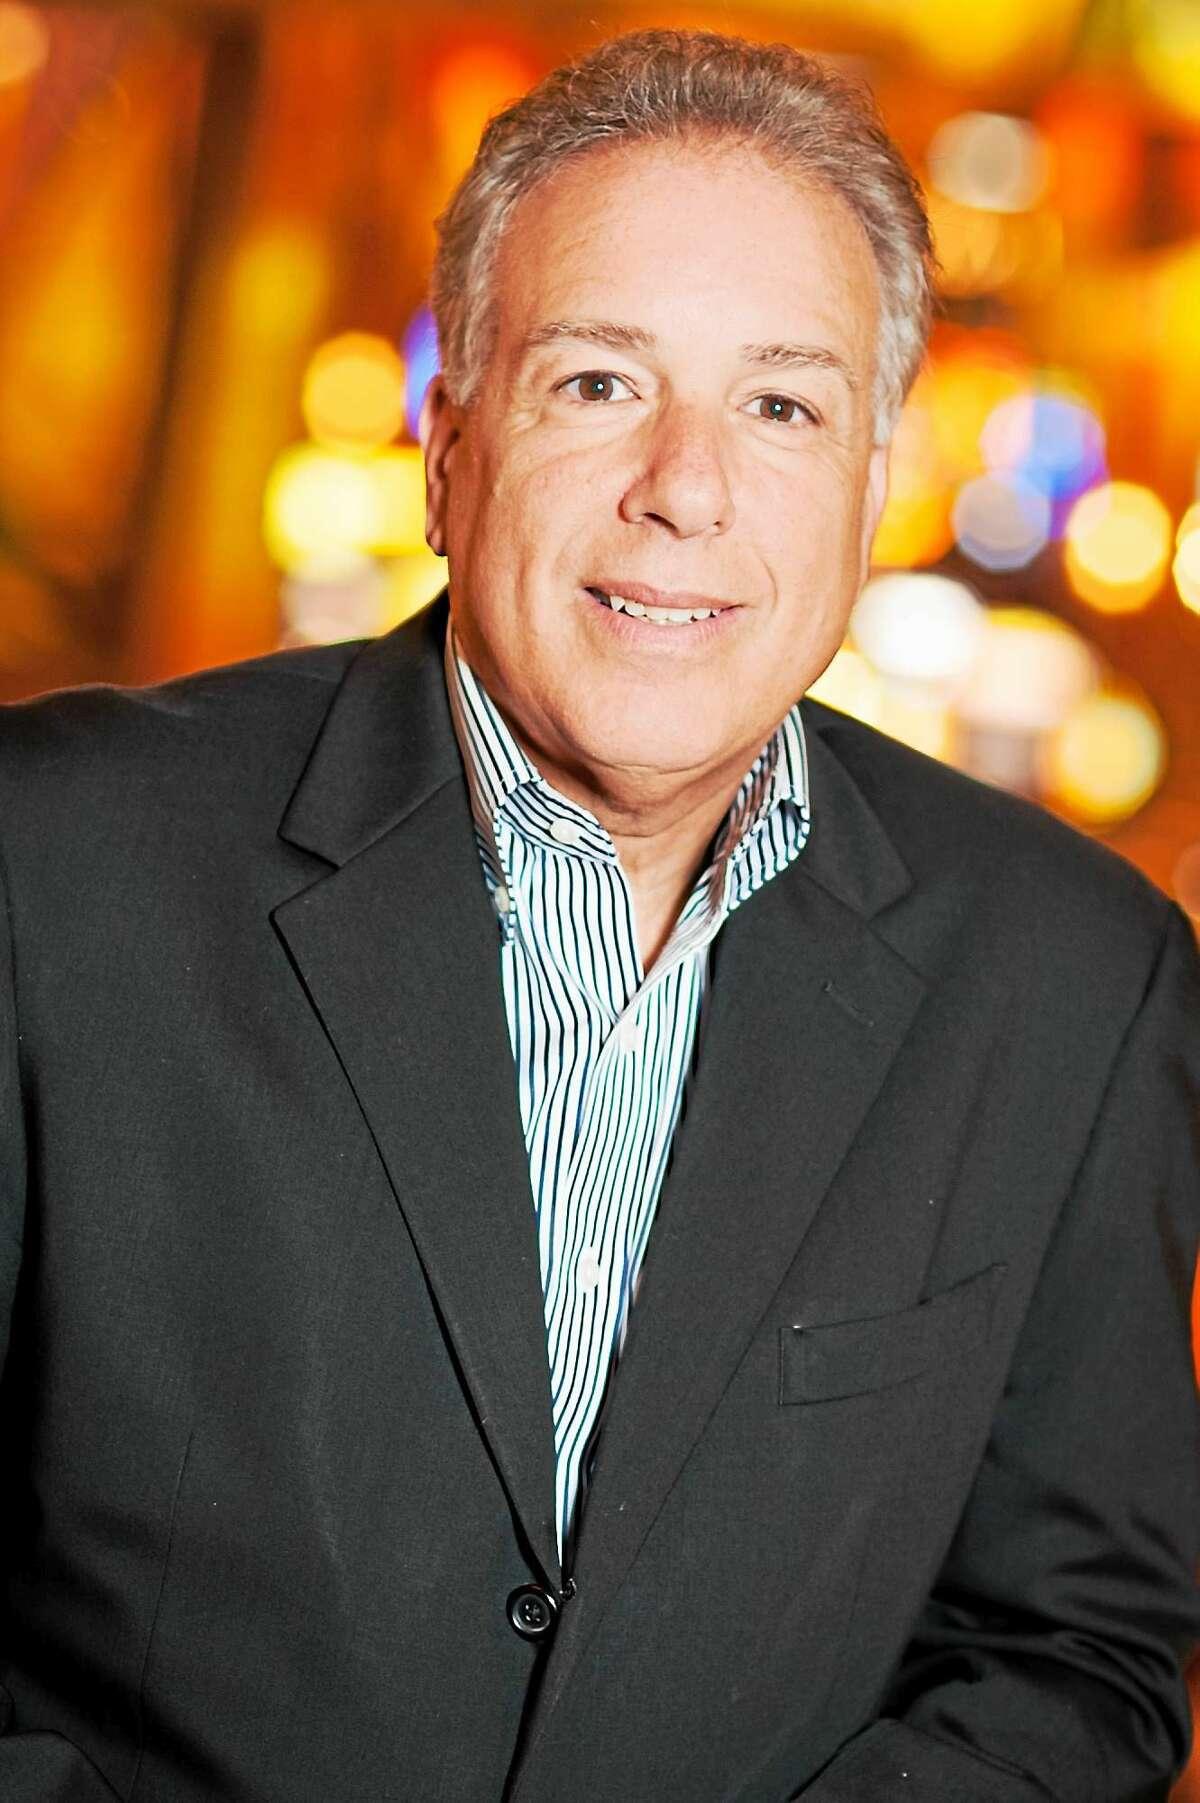 Mohegan Sun Tom Cantone, Mohegan's vice president of sports and entertainment.